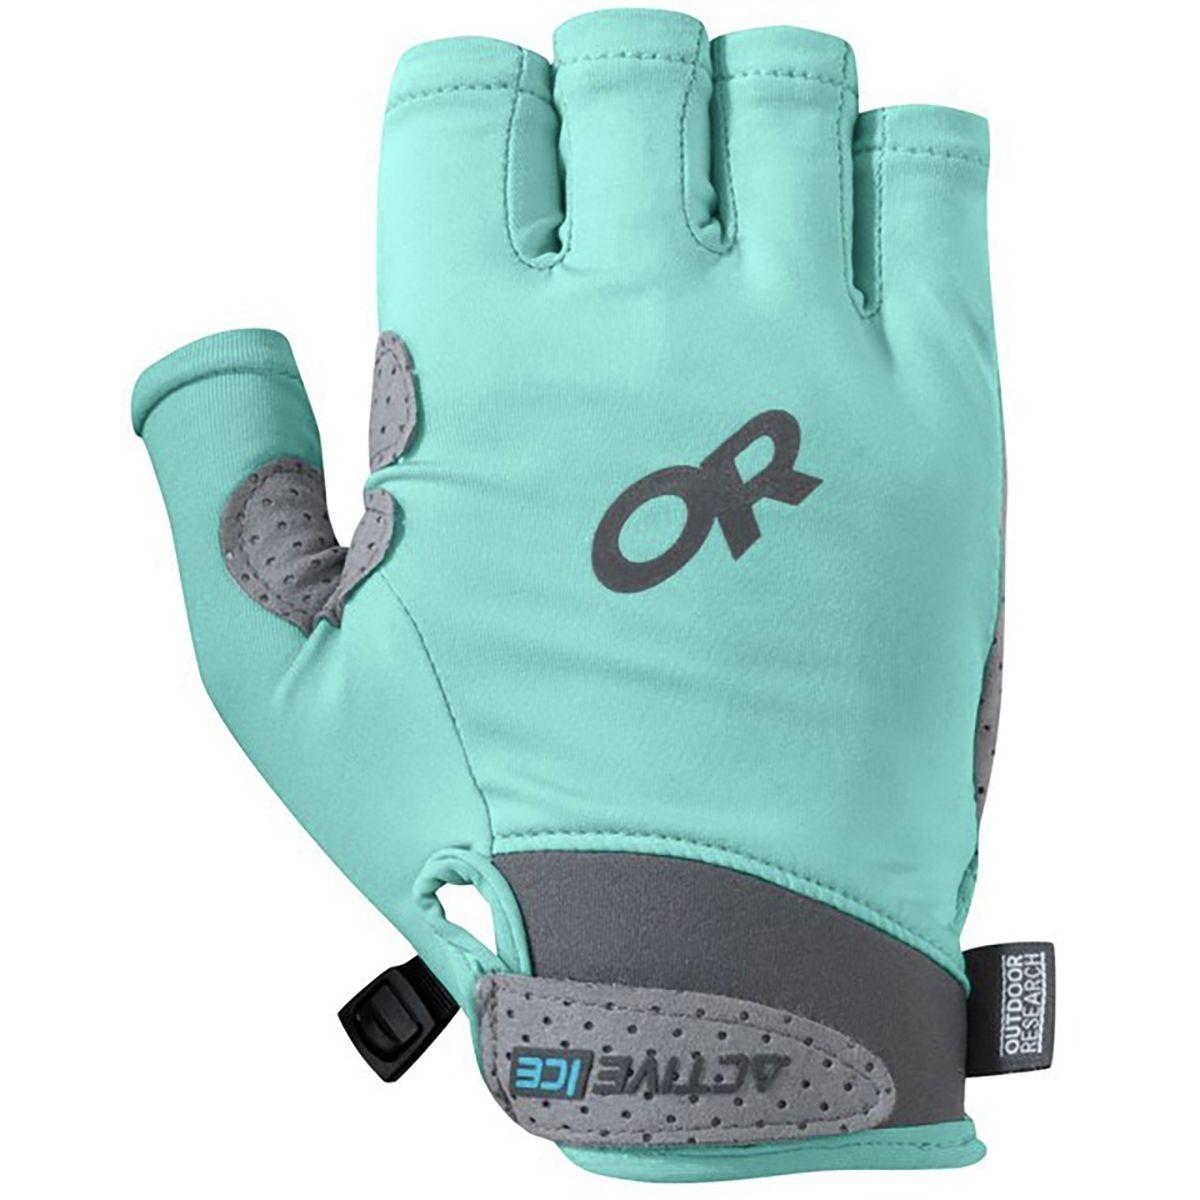 Outdoor Research ActiveIce Chroma Sun Gloves